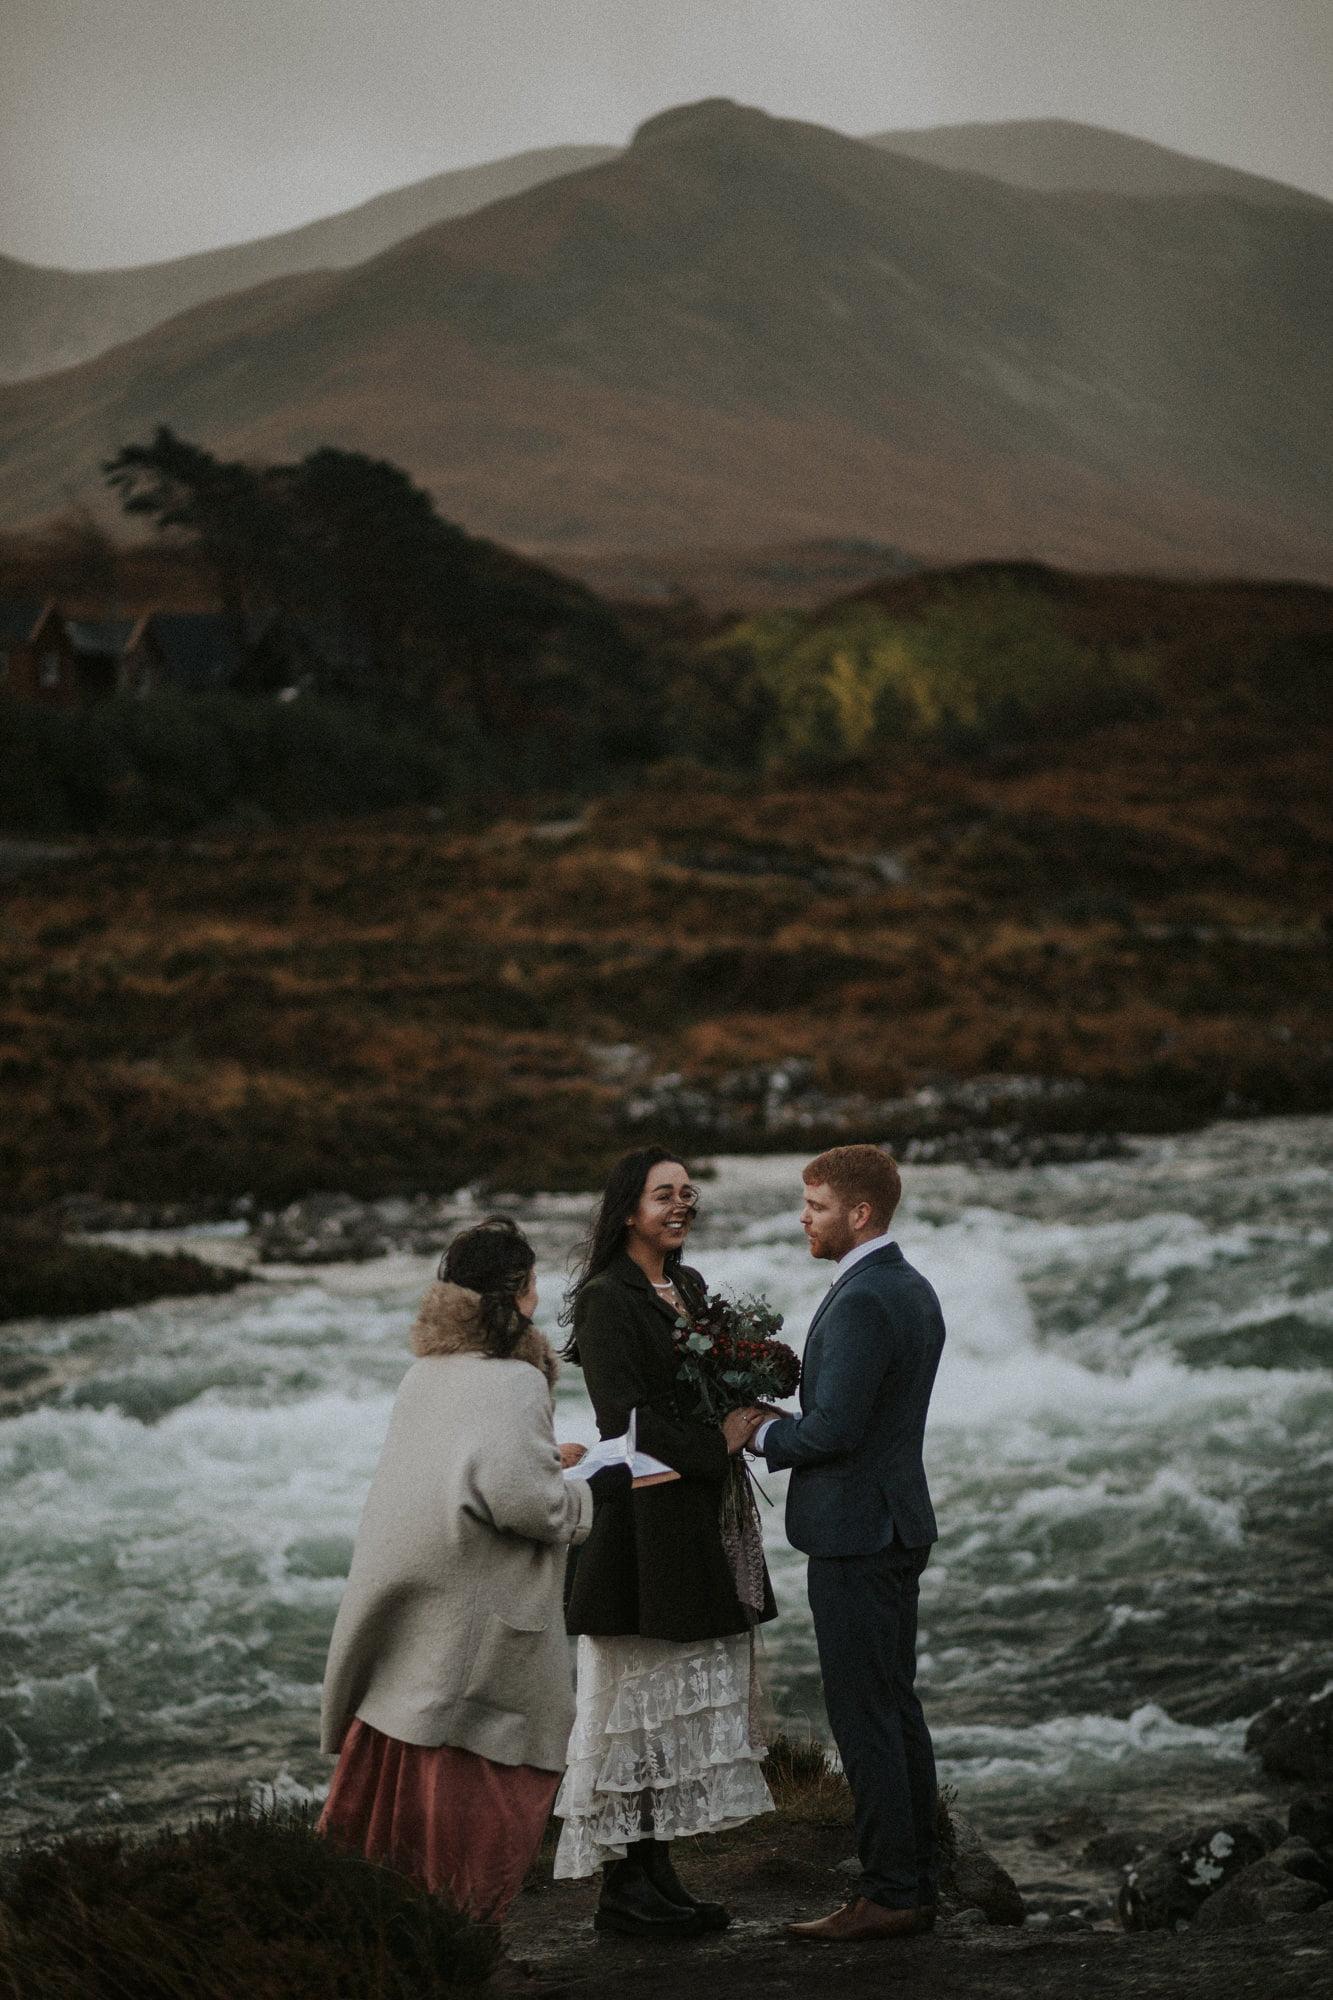 Isle of Skye Elopement Photographer, Sligachan Isle of Skye Elopement, The Quiraing Isle of Skye Elopement, the best locations to elope Isle of Skye,